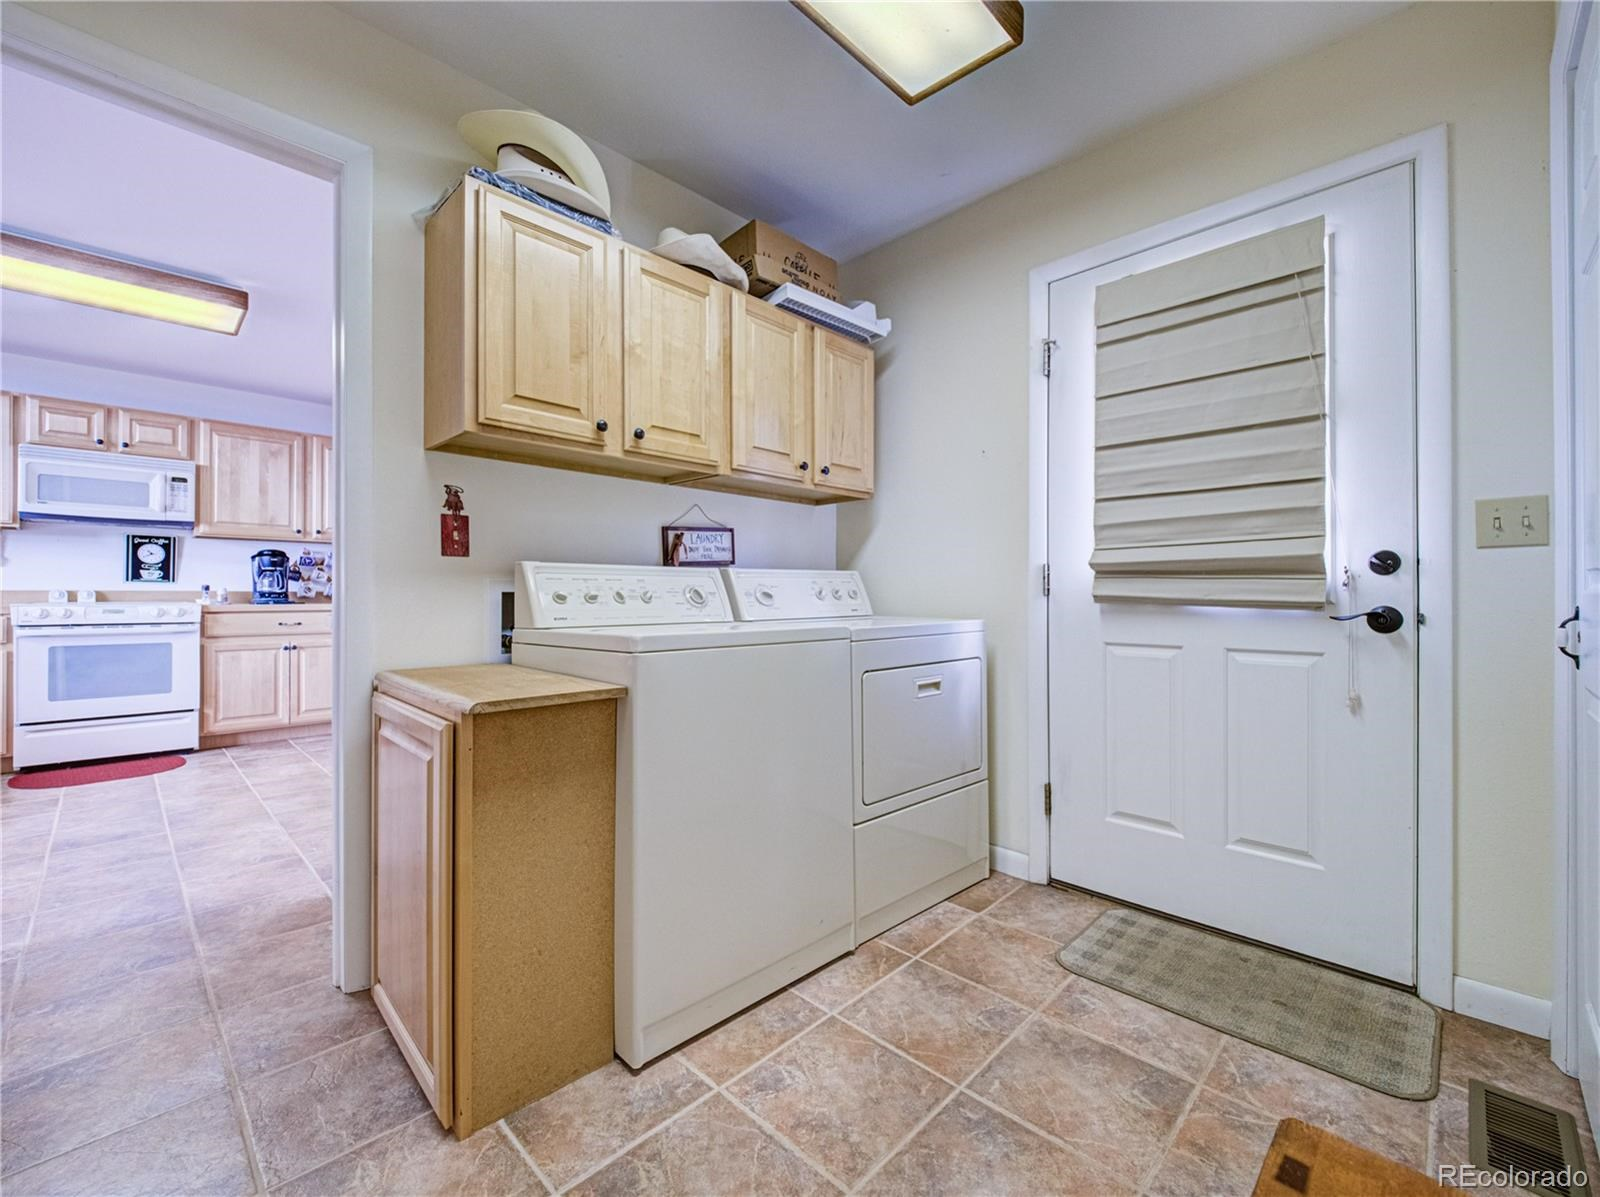 MLS# 3332968 - 9 - 296 Cedar Bluff Drive, Cotopaxi, CO 81223